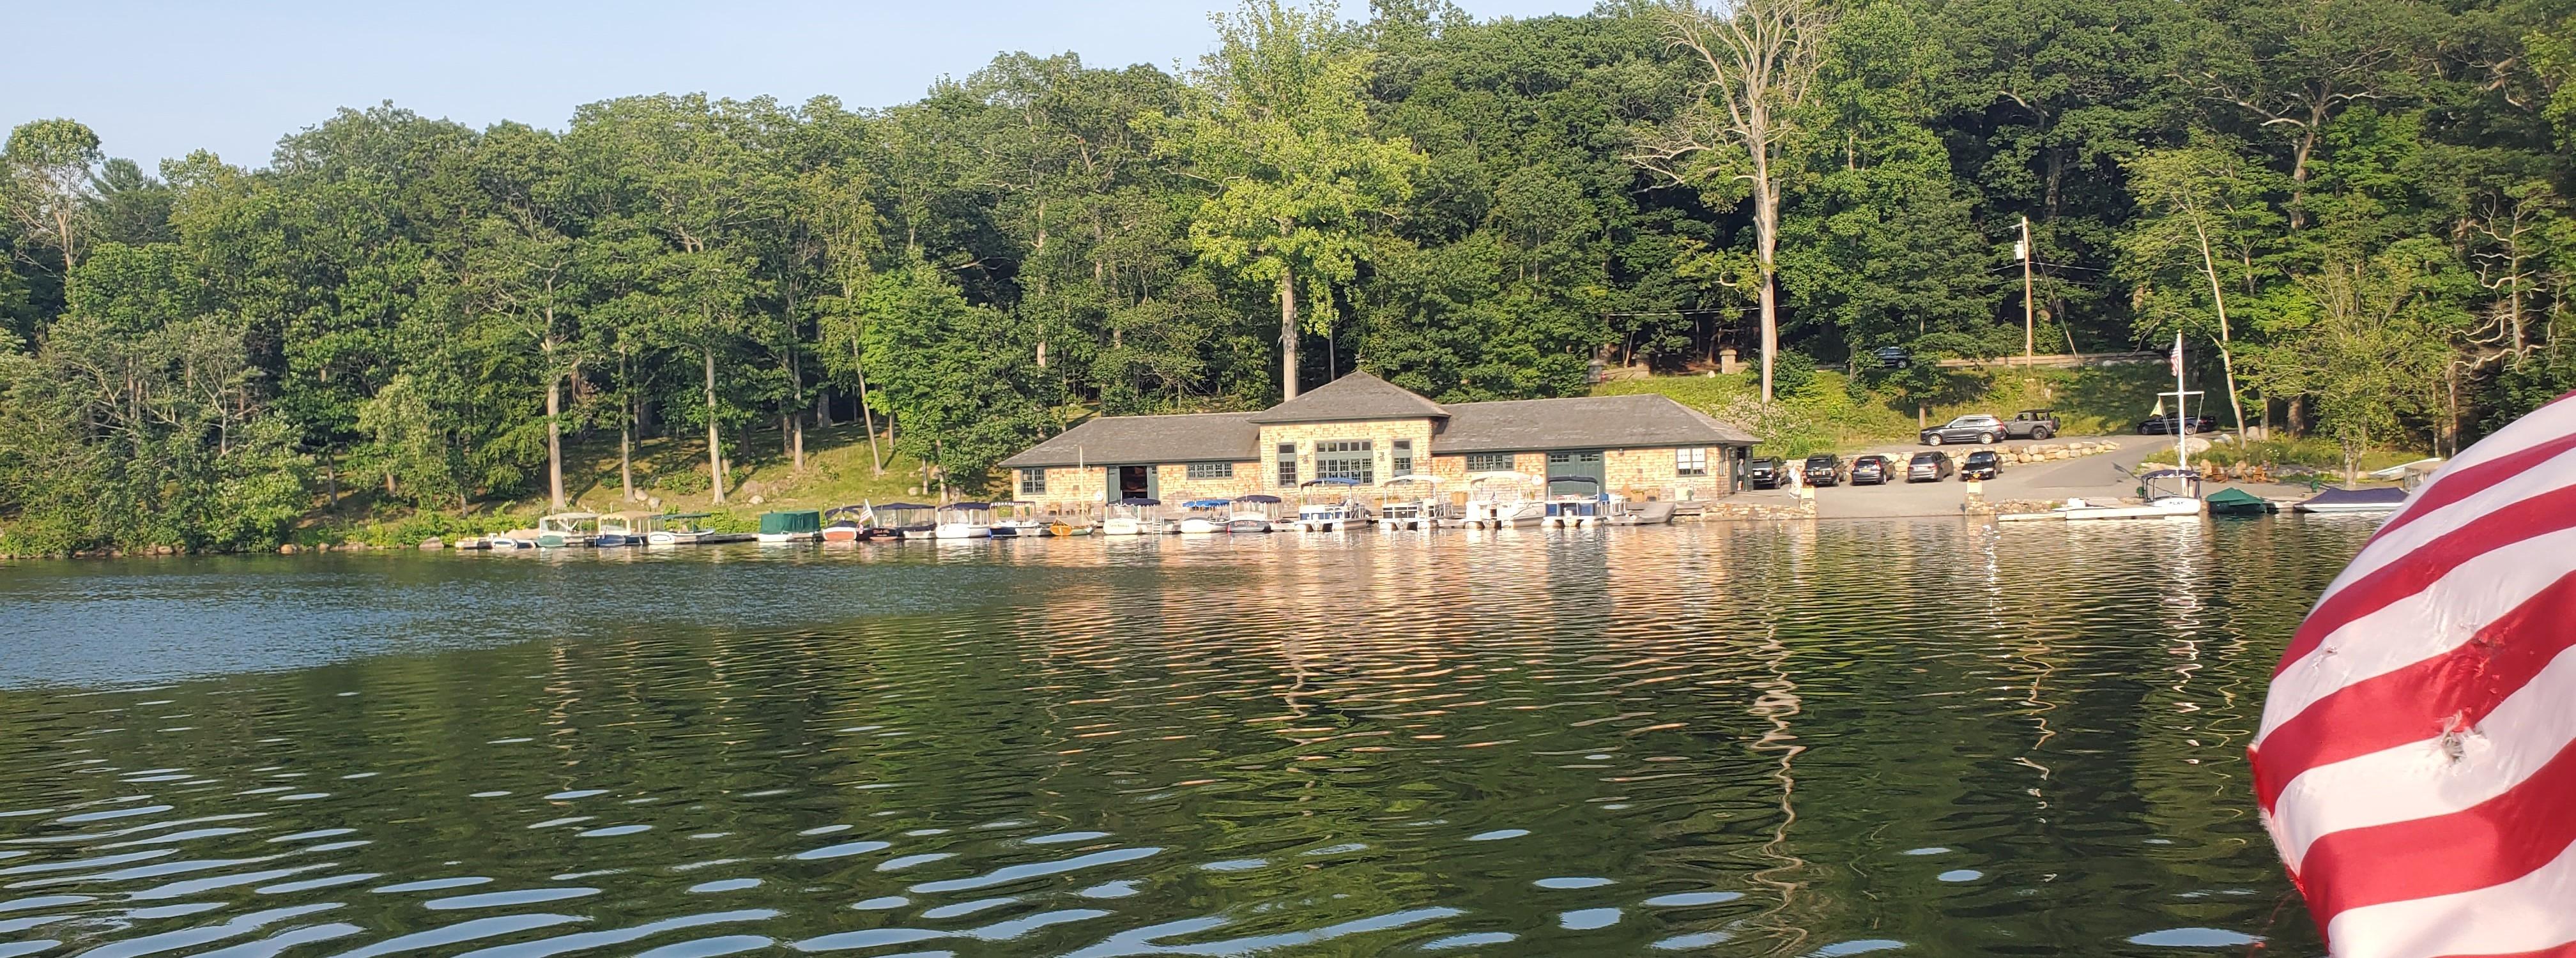 The Tuxedo Club Boathouse